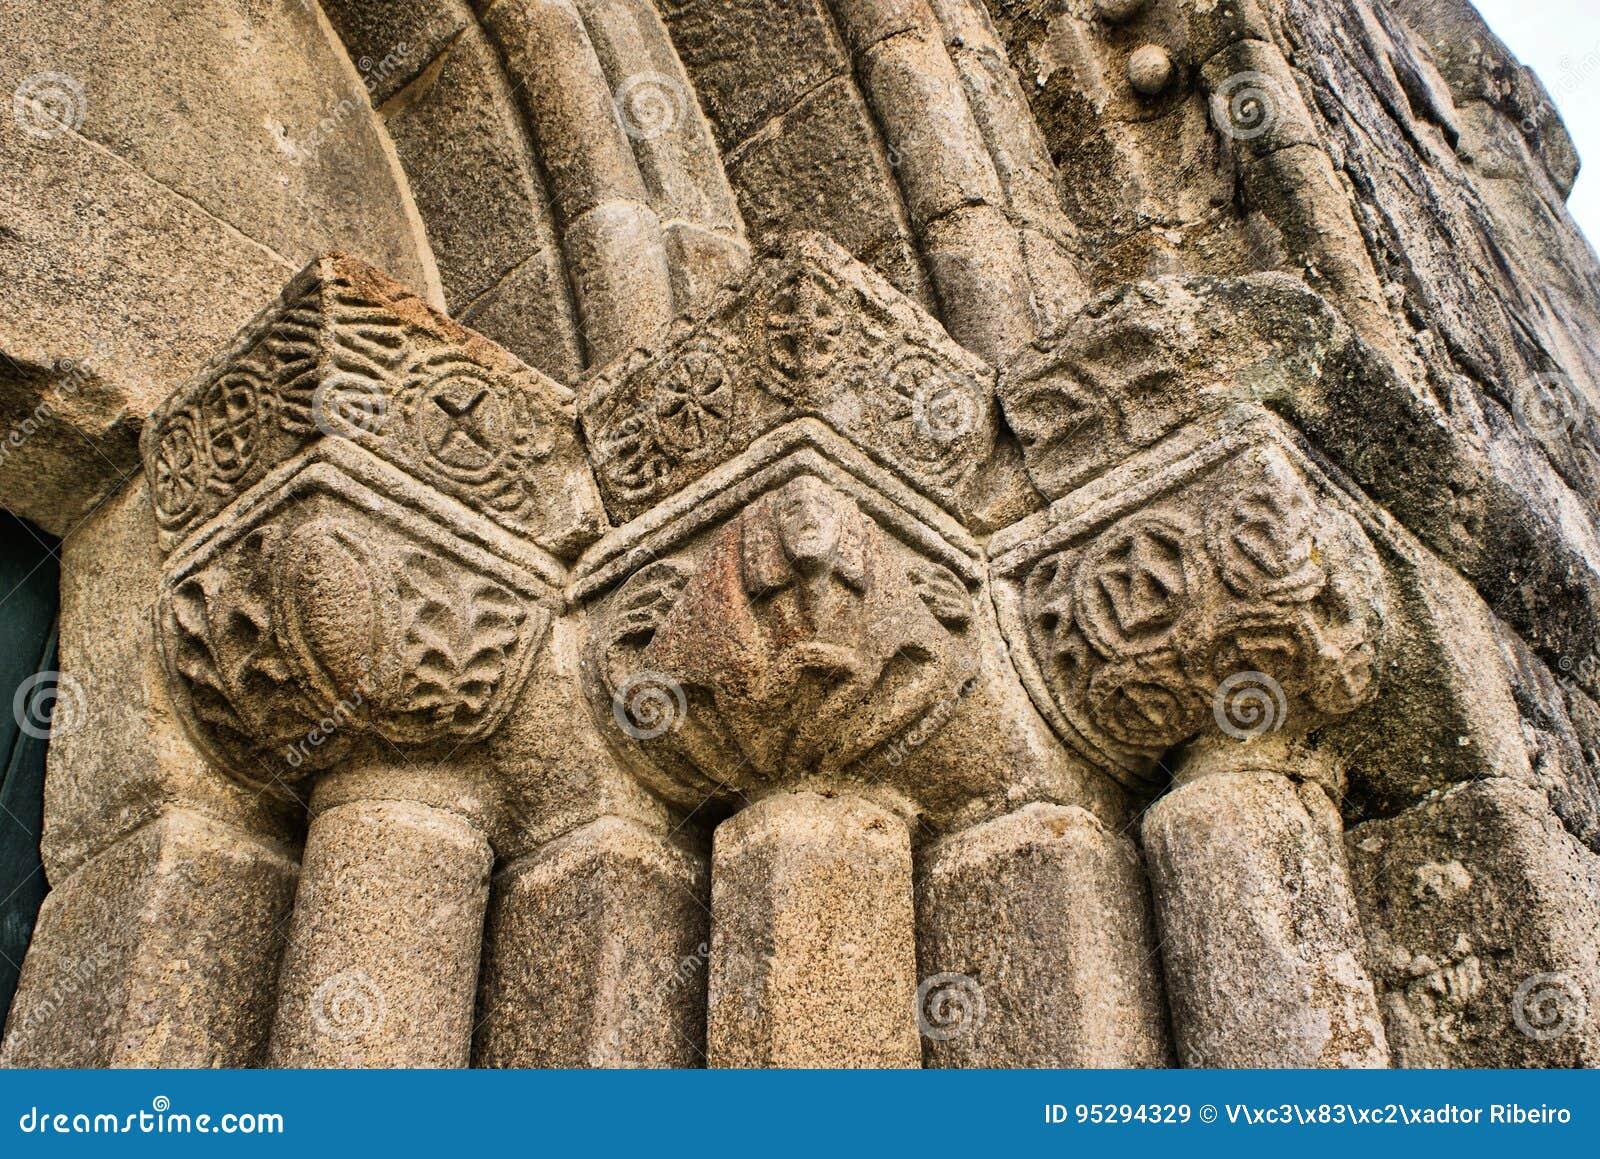 Detail of Boelhe romanesque church in Penafiel